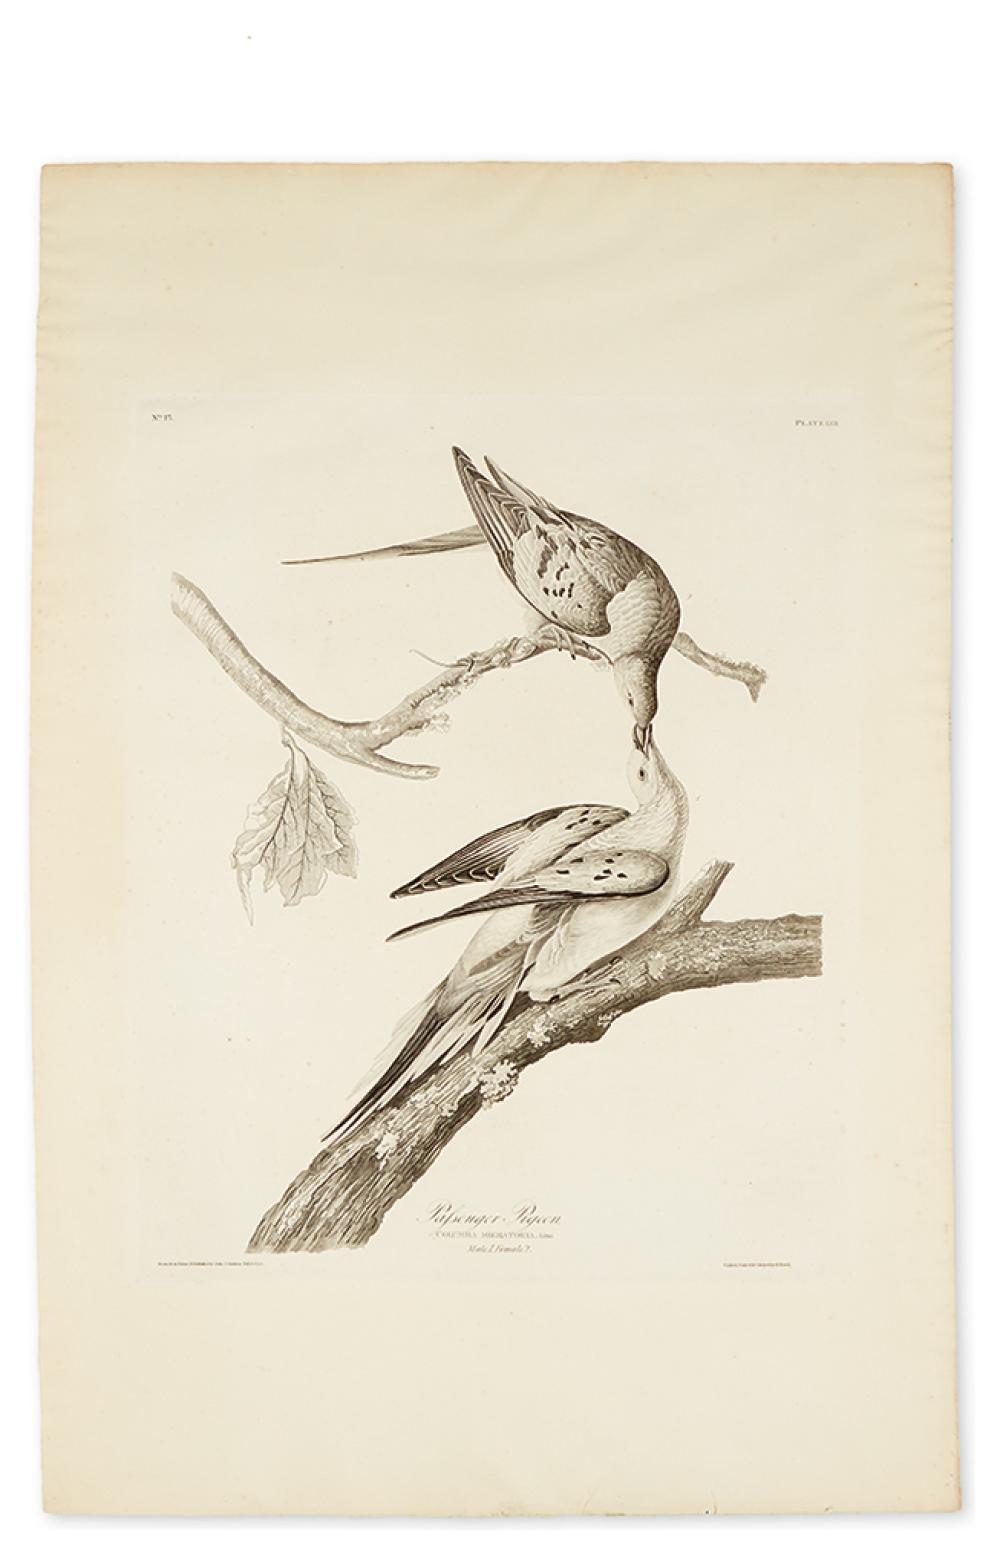 AUDUBON, JOHN JAMES. Passenger Pigeon. Plate LXII. [Variant 2.]